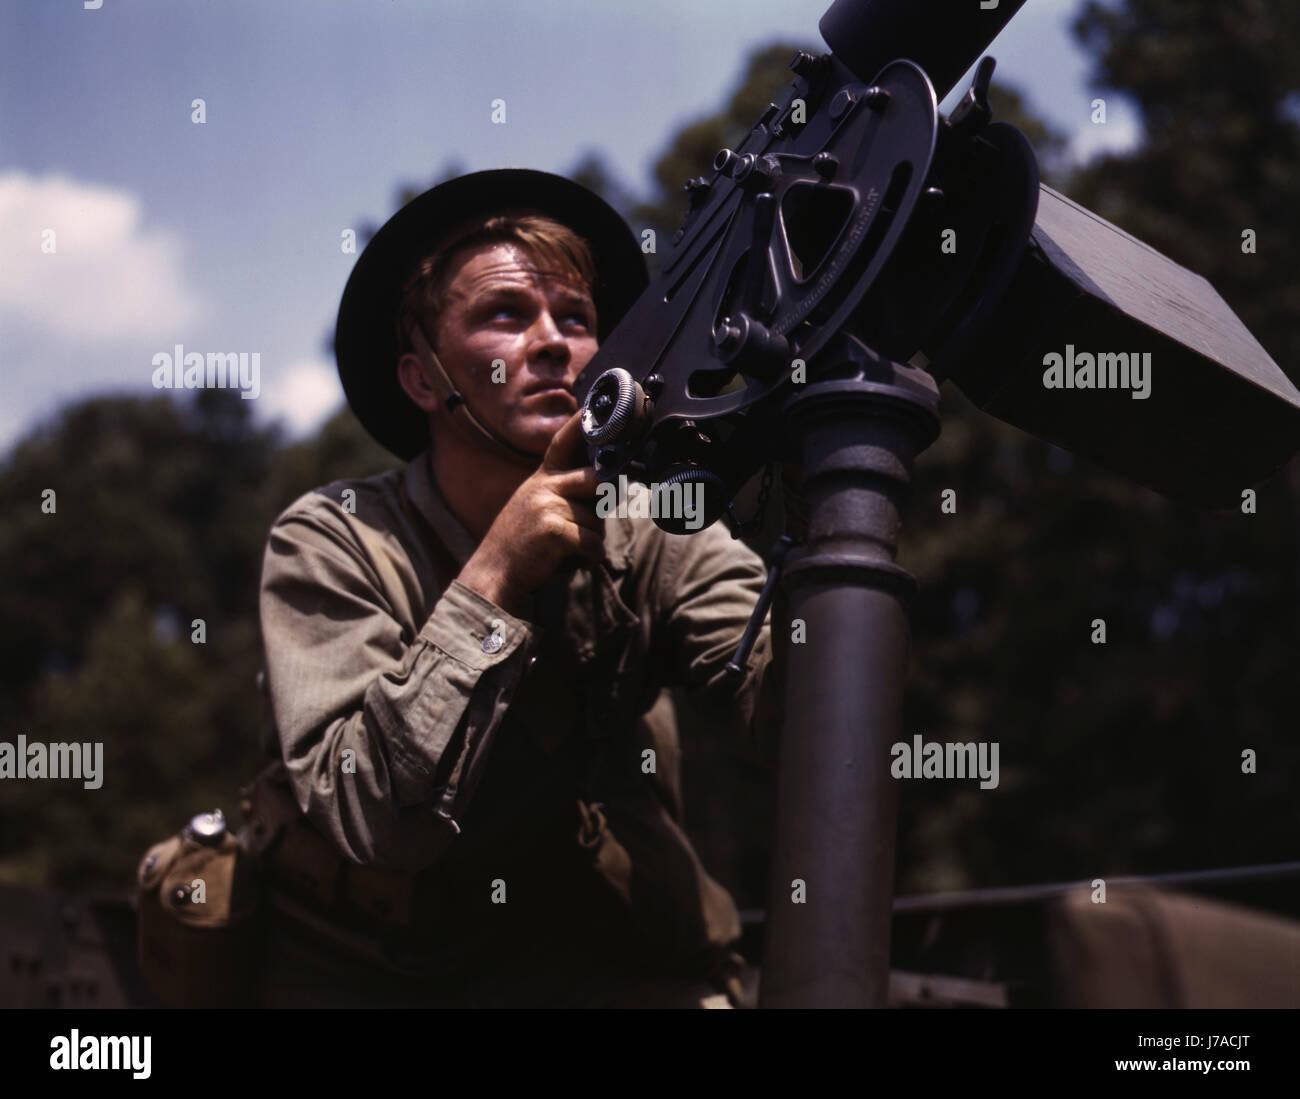 A U.S. soldier shooting a 30 caliber Browning machine gun. - Stock Image